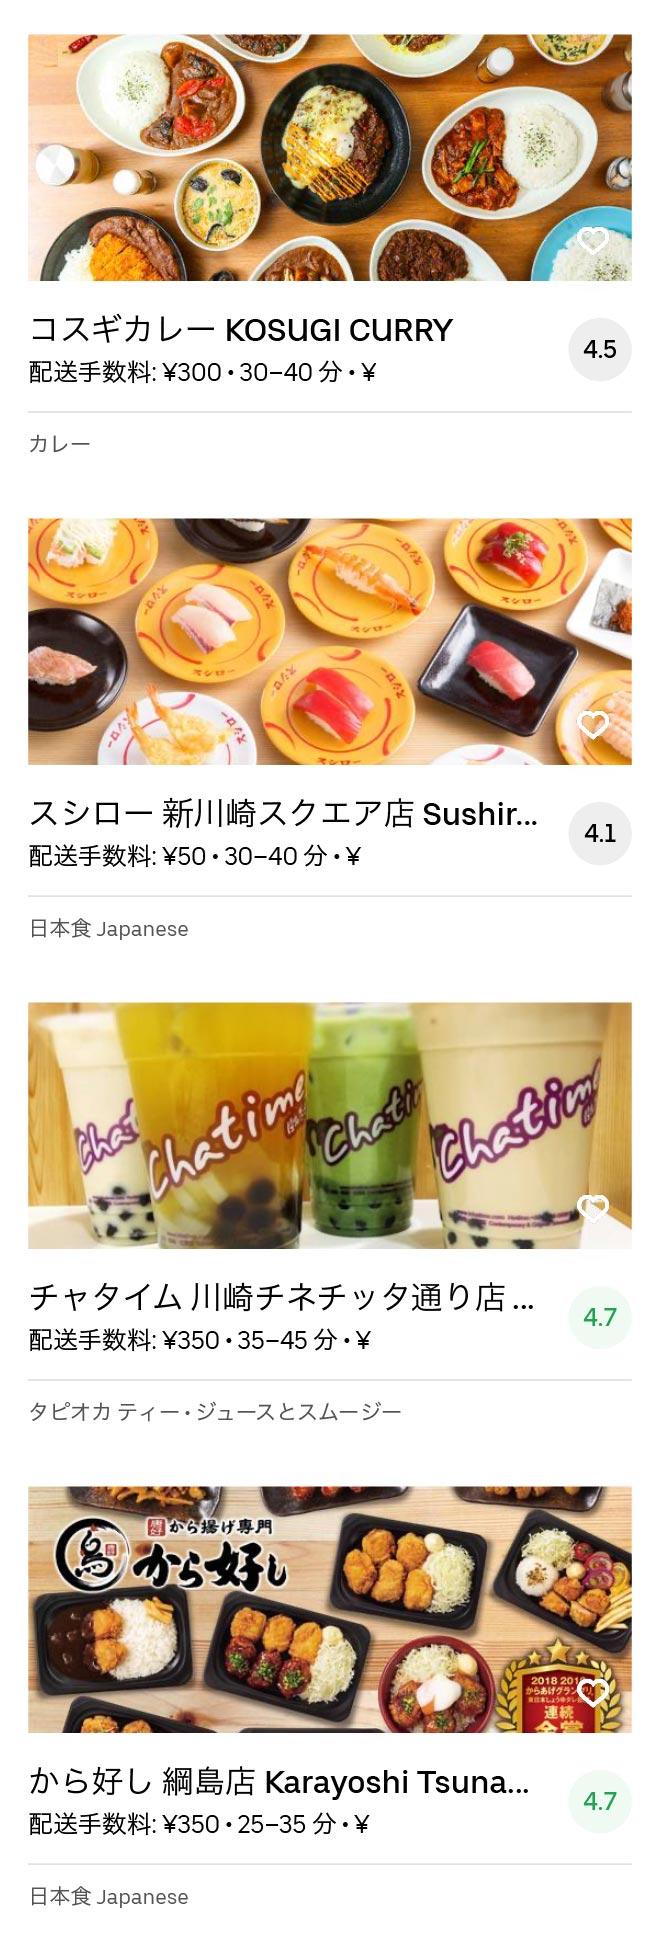 Shin kawasaki menu 2004 06